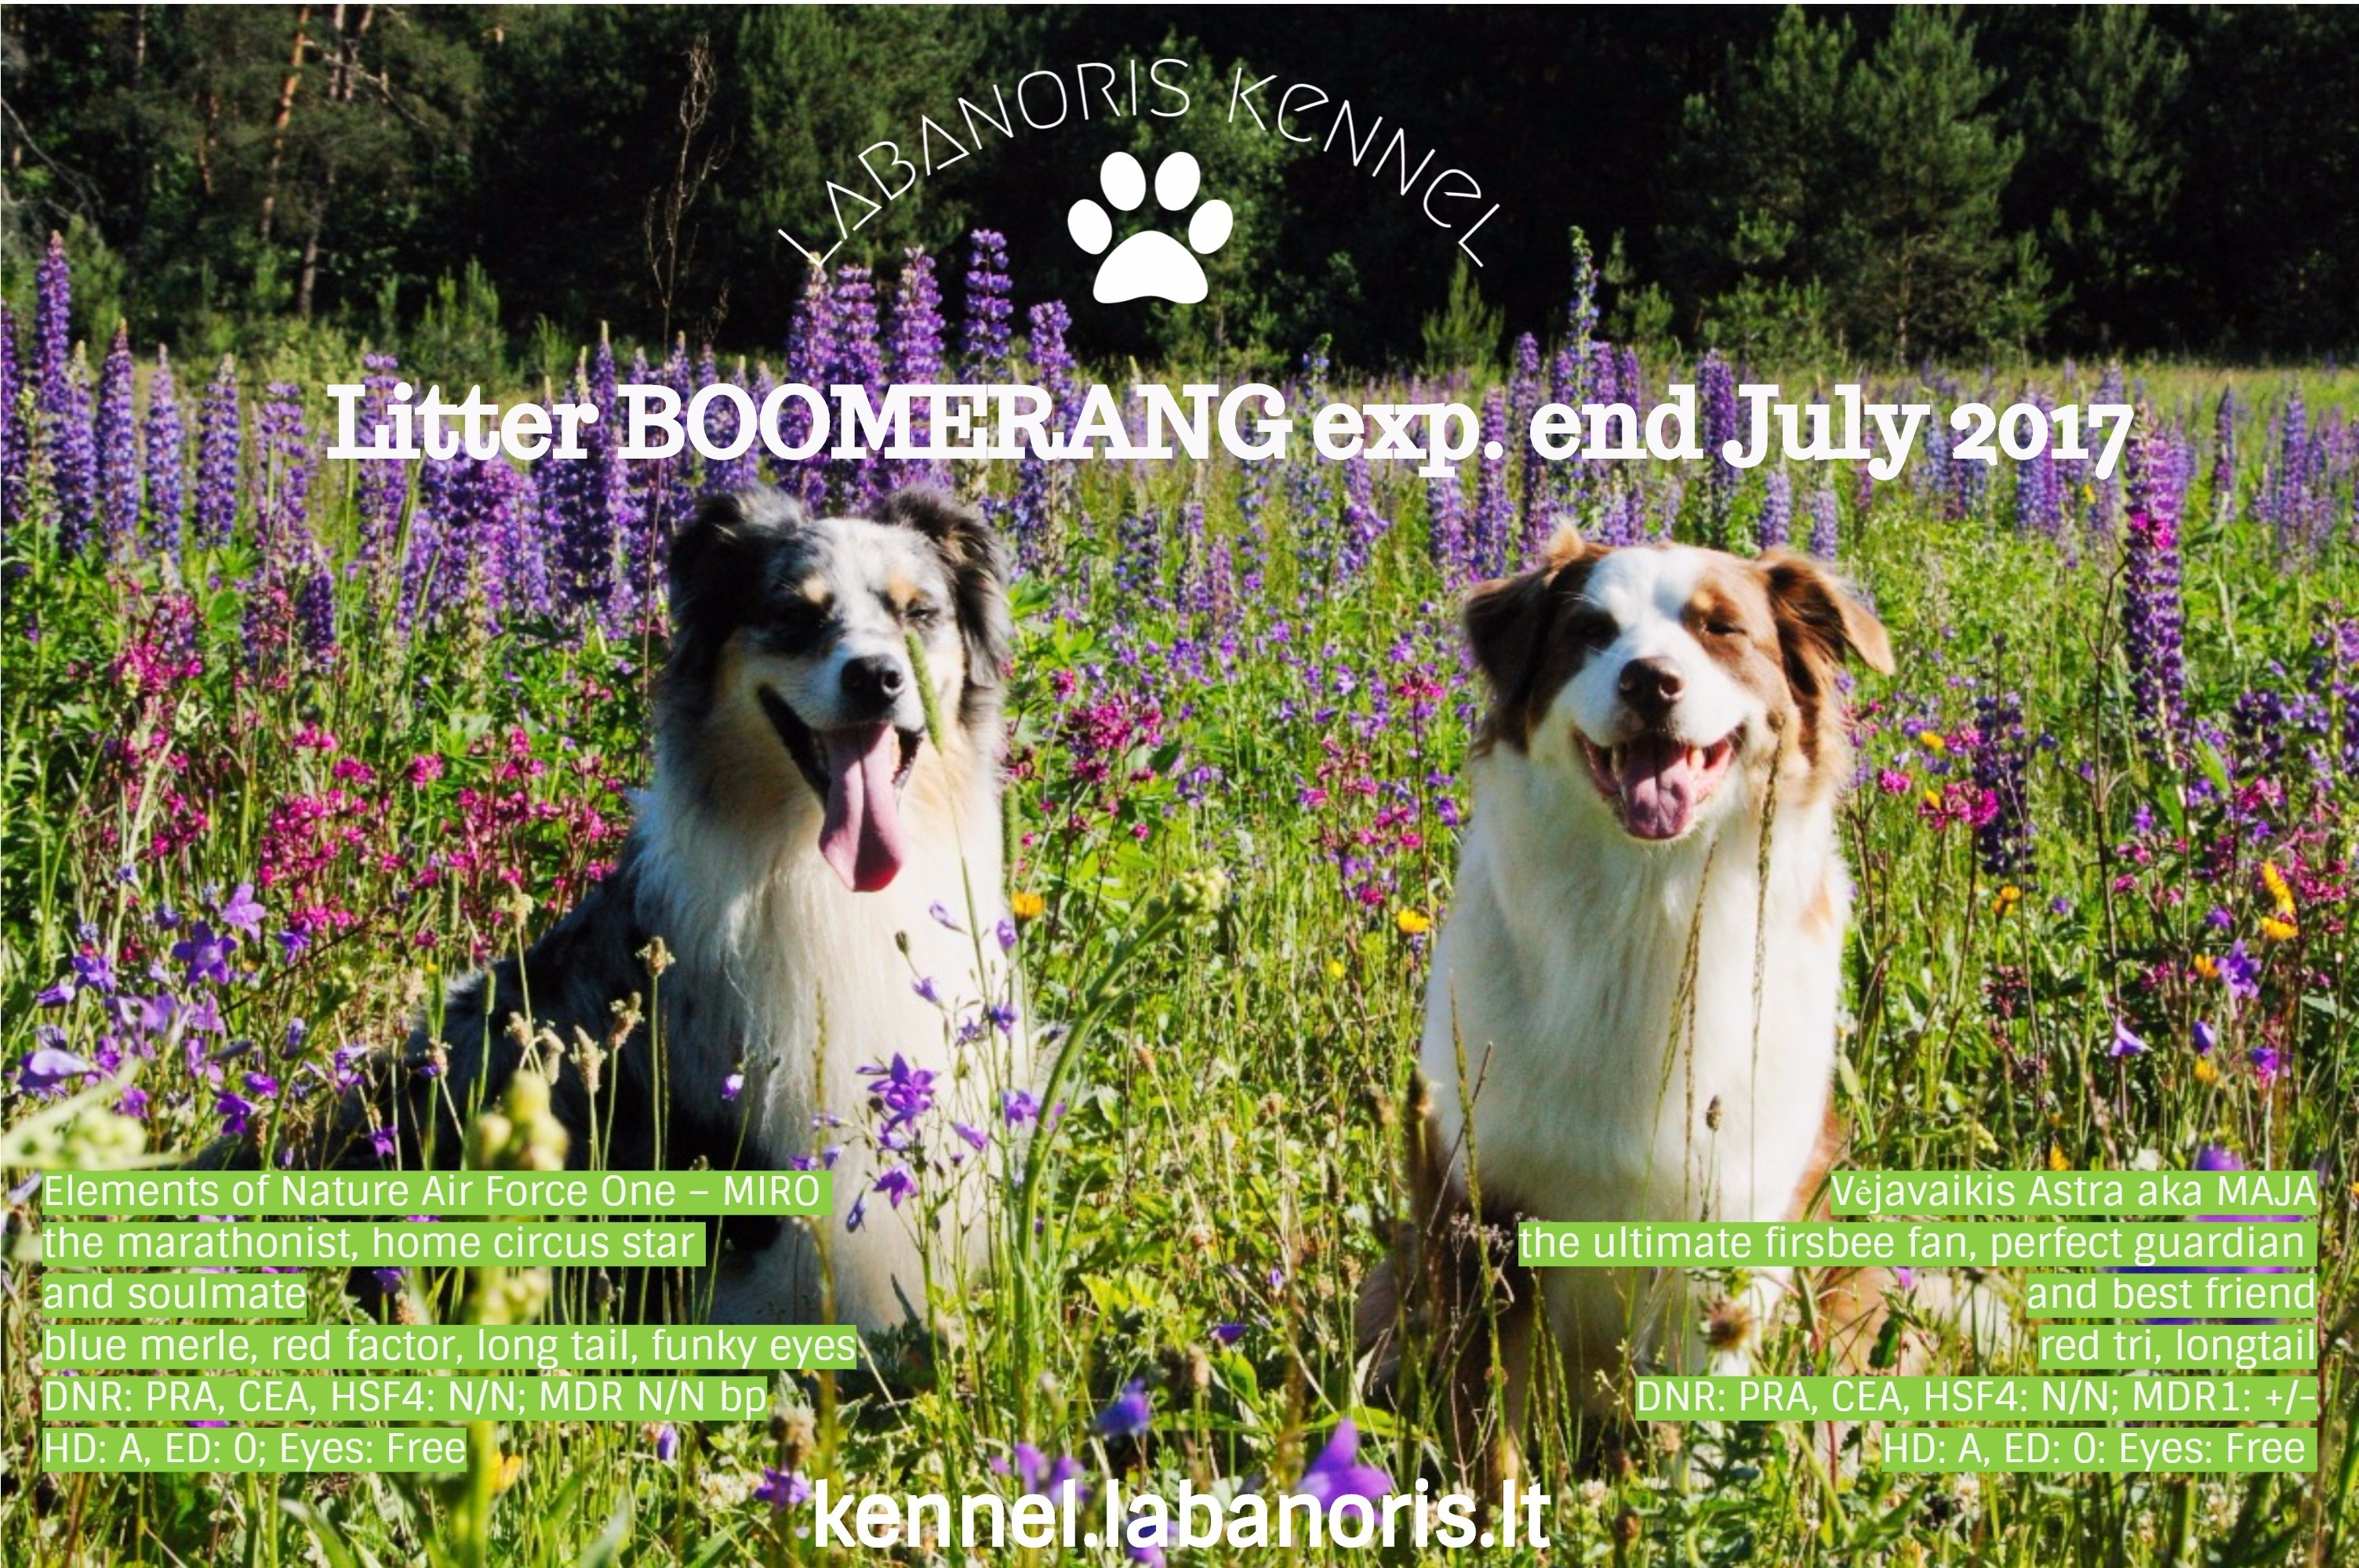 Australian Shepherd puppies Labanoris Boomerang - labanoris kennel